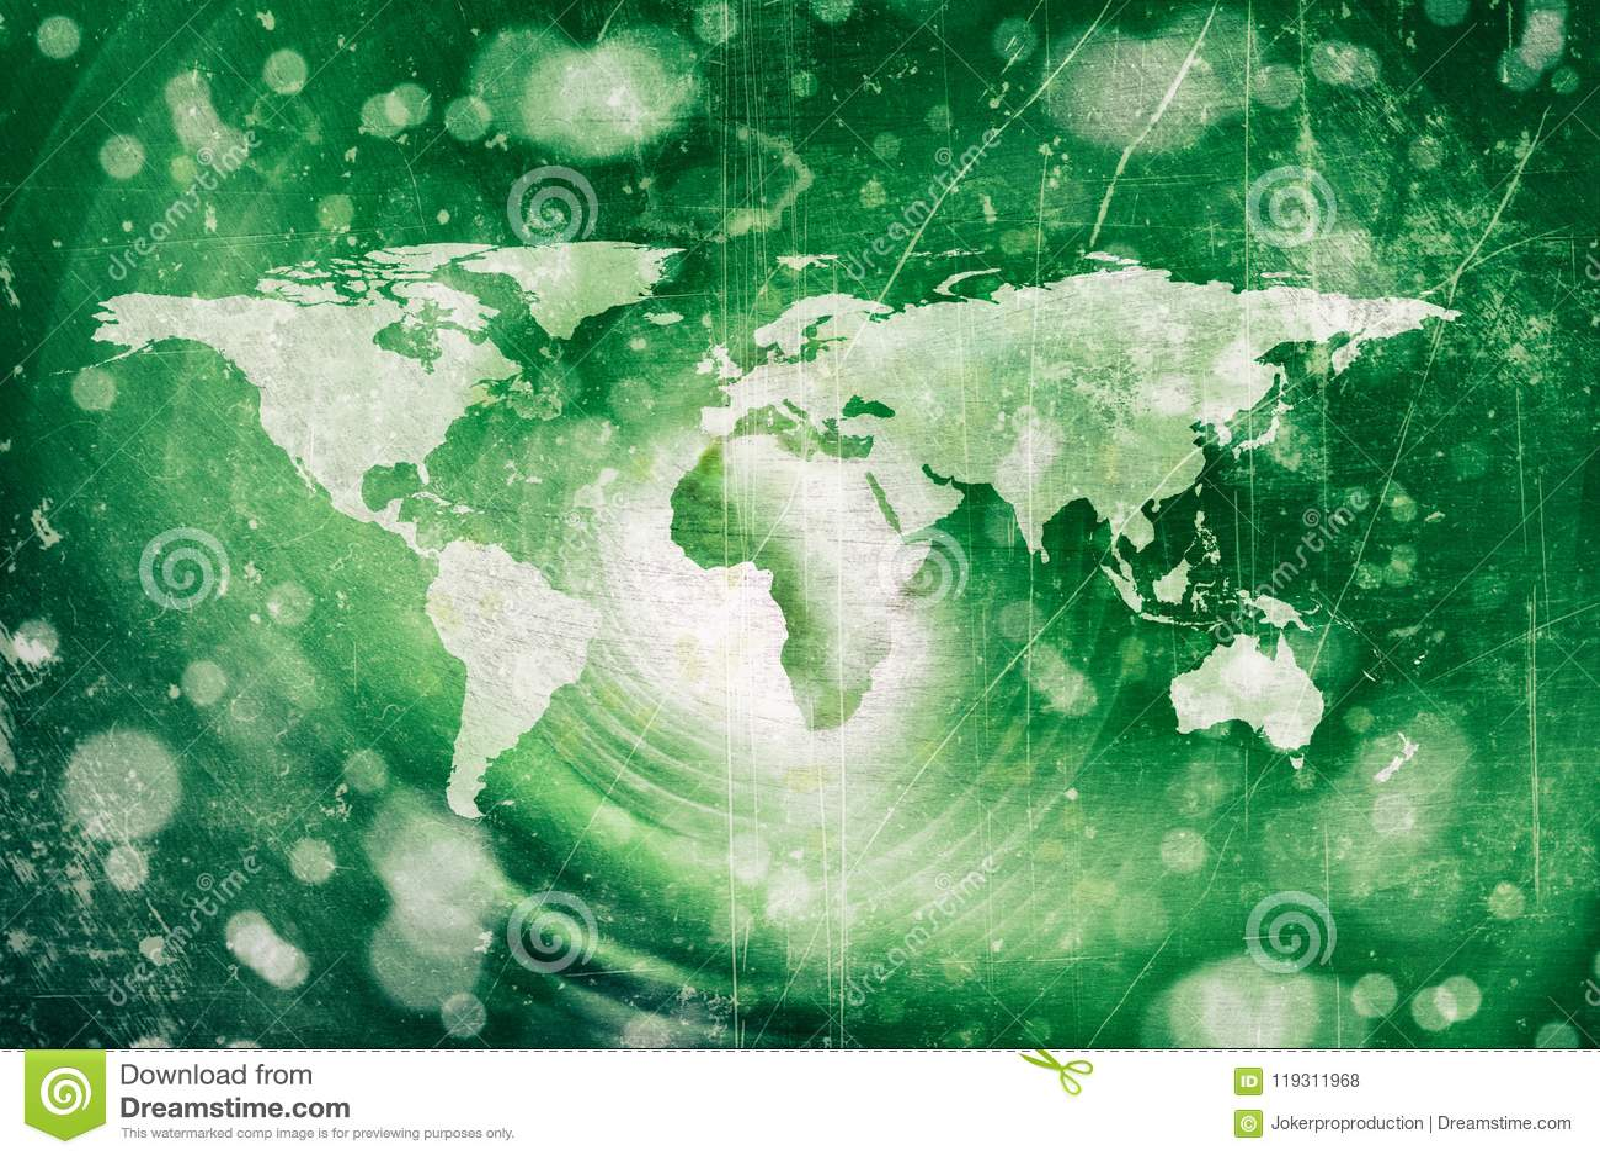 Abstract world map stock illustration  Illustration of light - 119311968